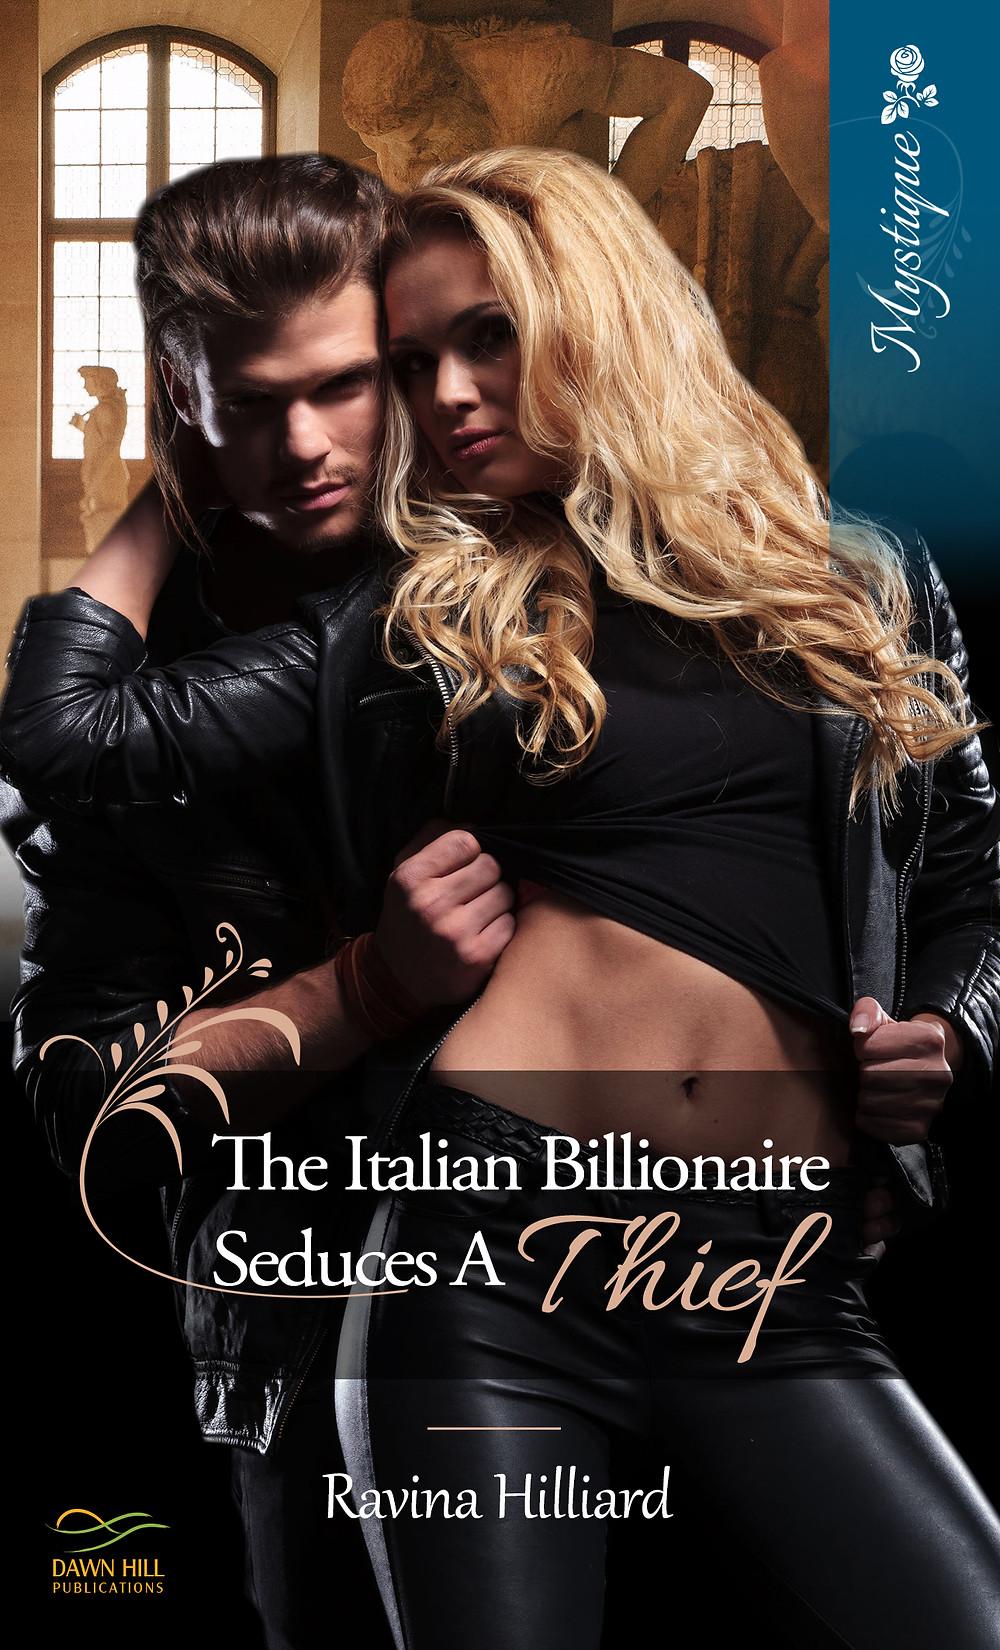 The Italian Billionaire Seduces A Thief